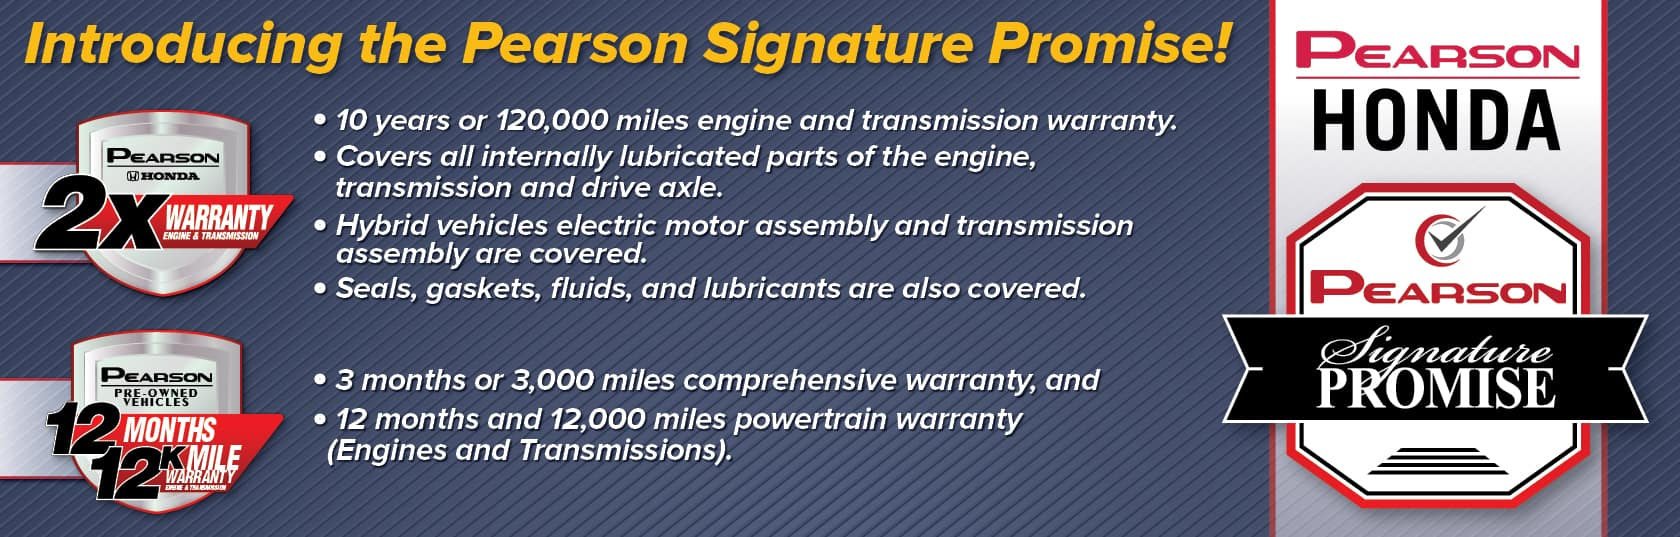 The Pearson Signature Promise